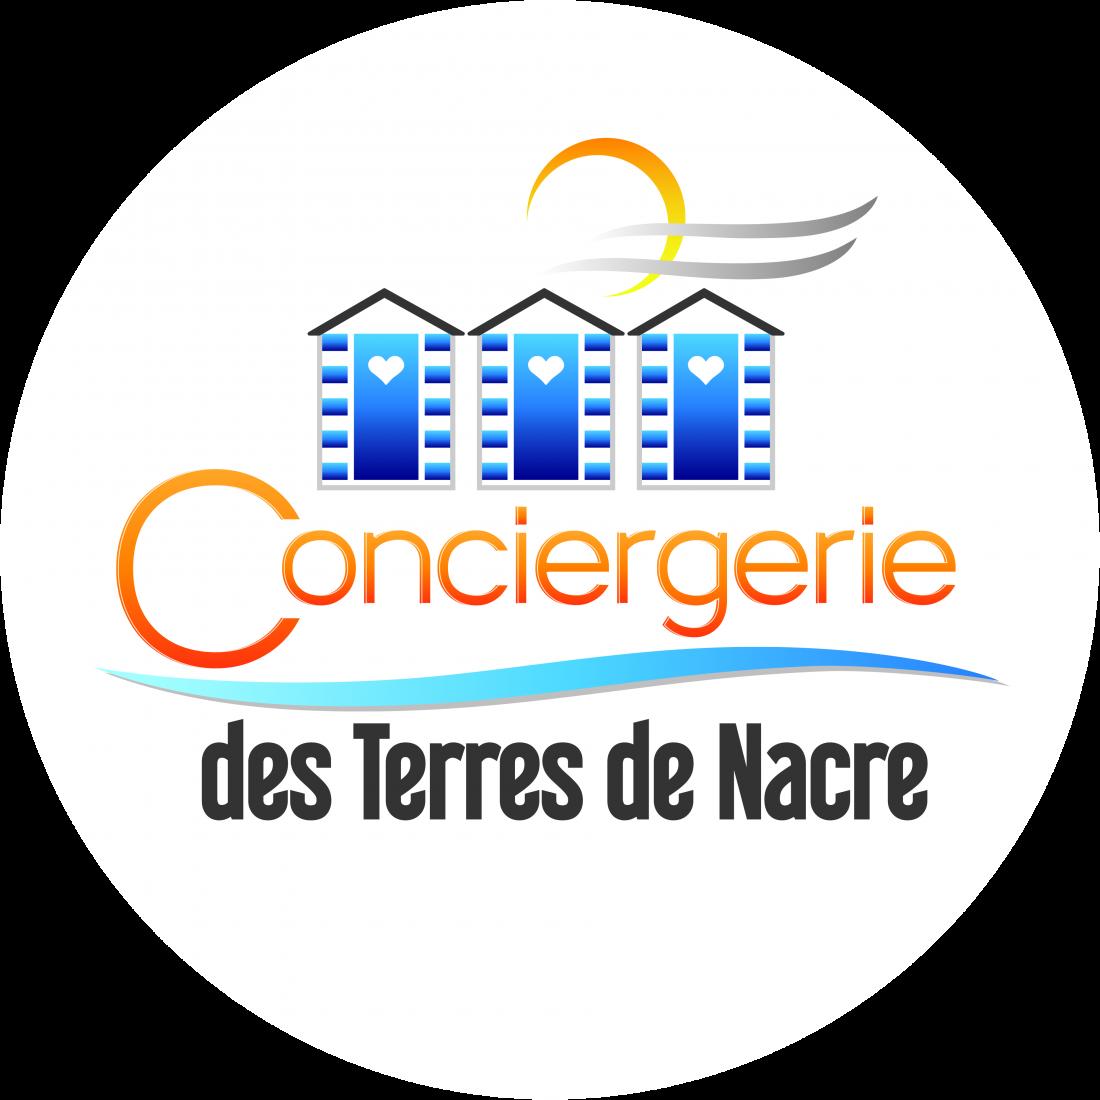 Logo de Conciergerie des Terres de Nacre